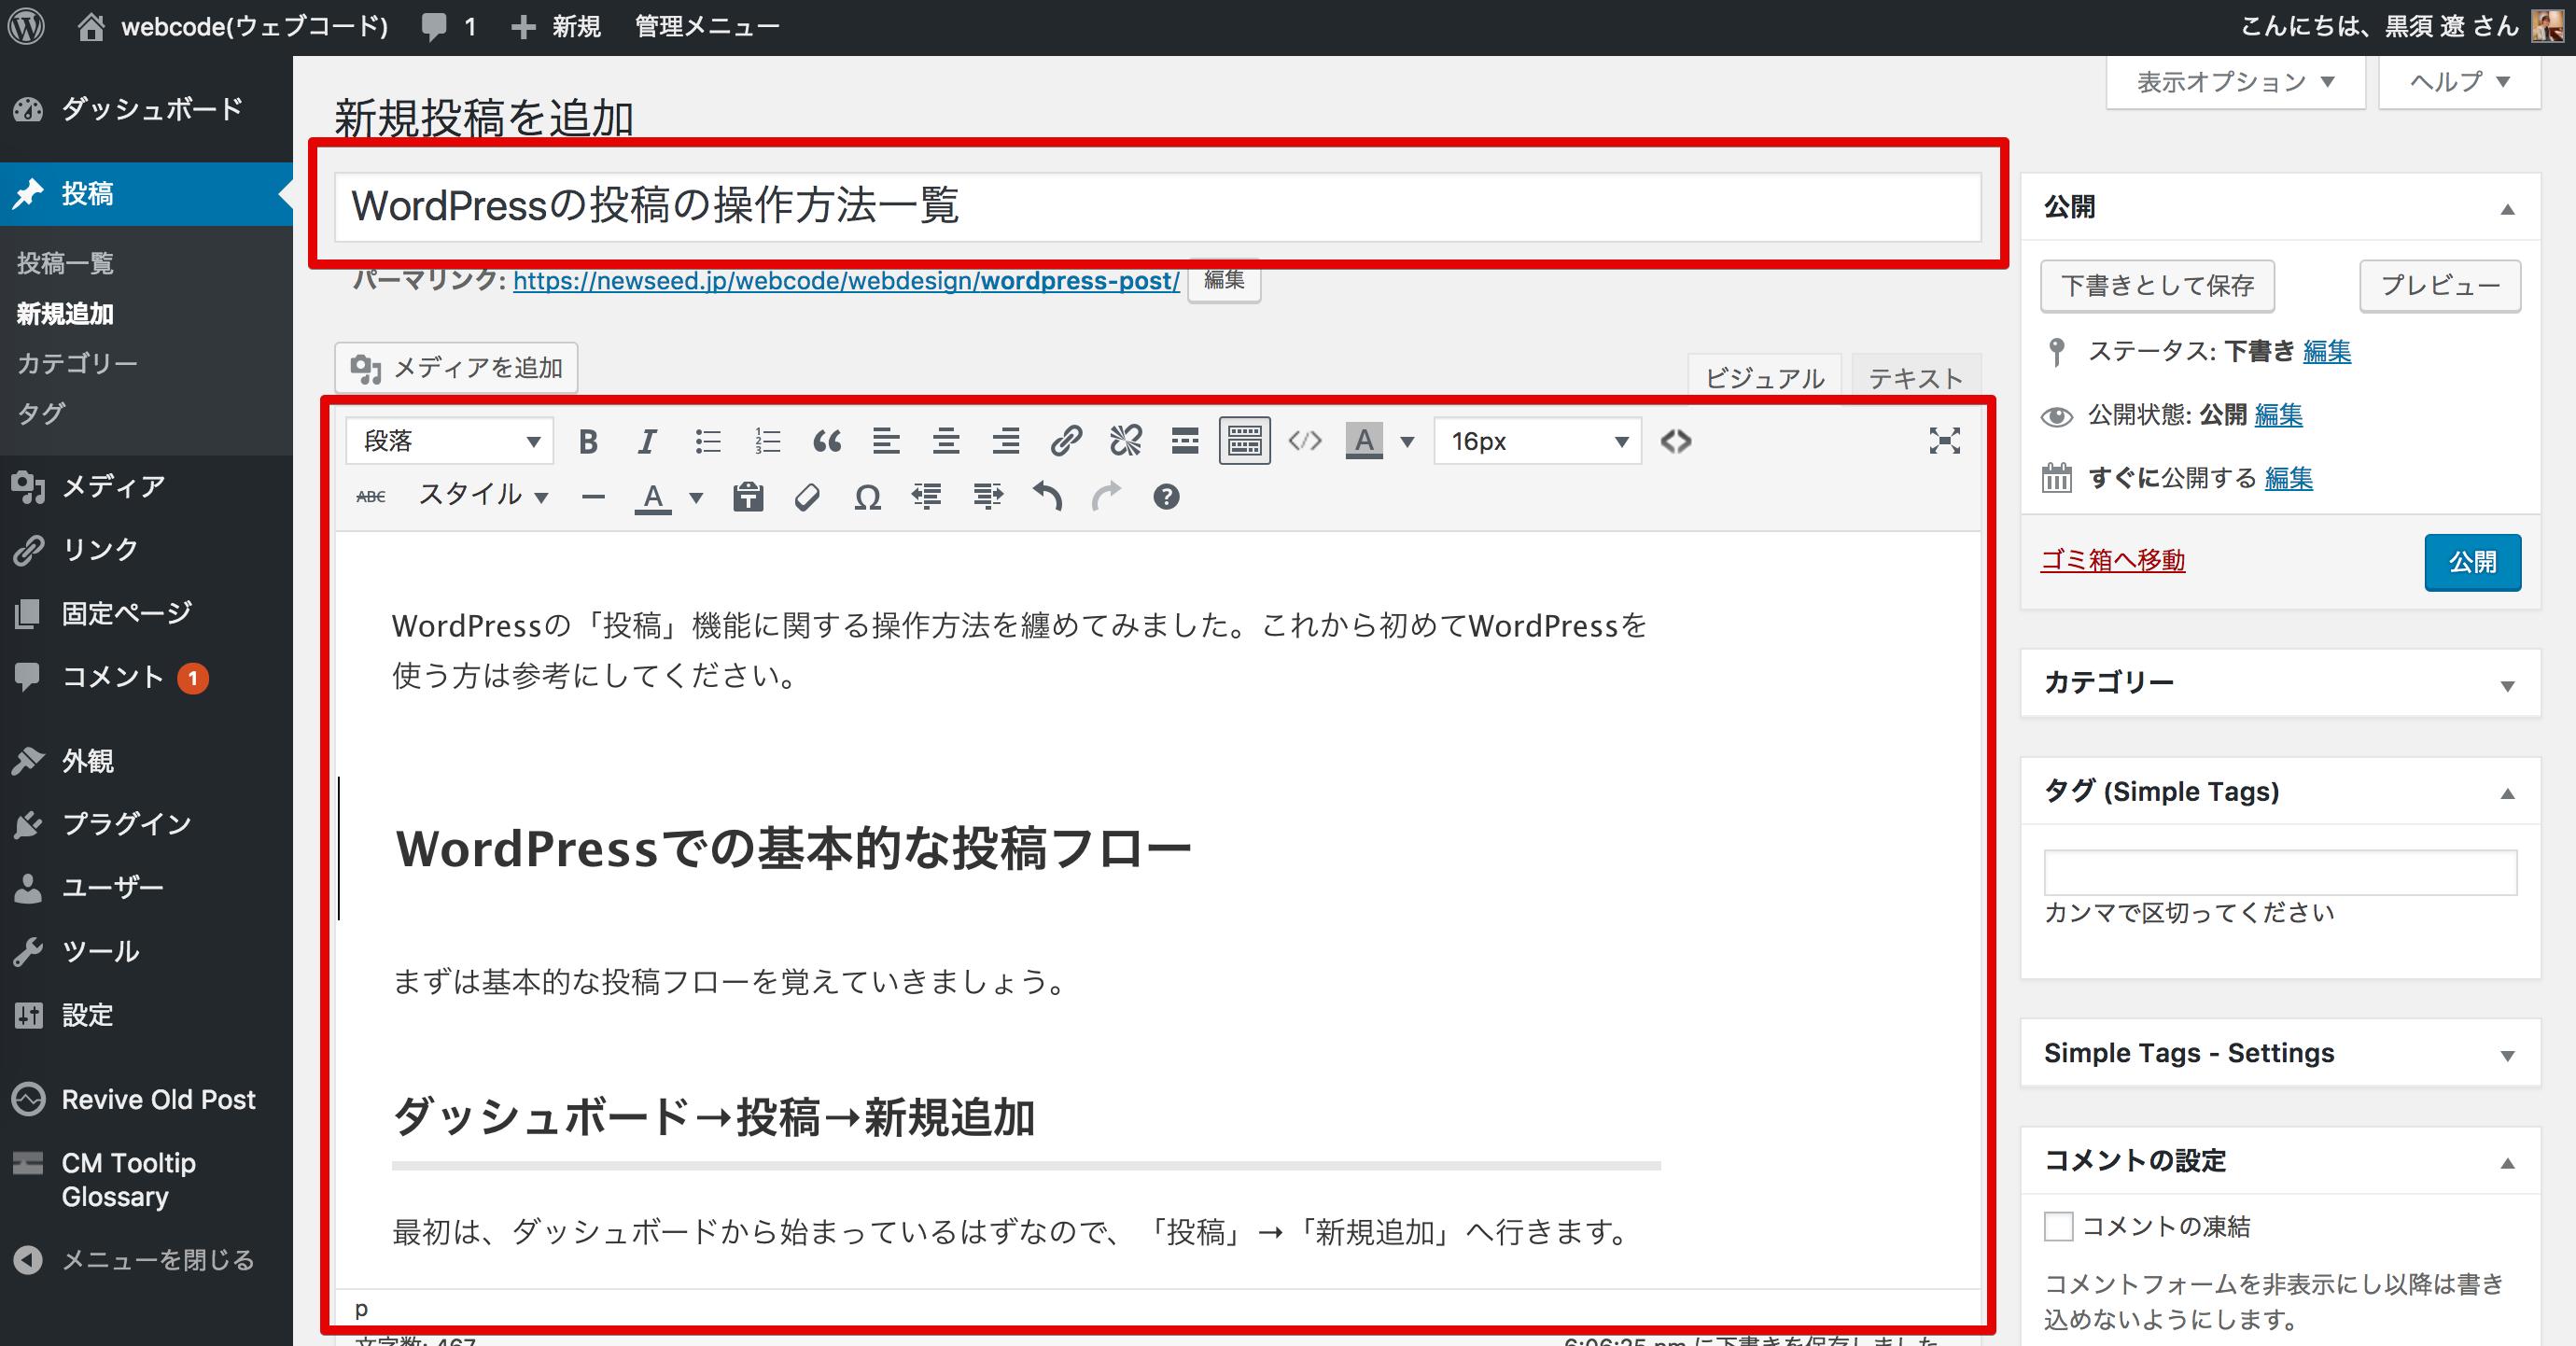 9b85466622eed7575441829a030b7bfb - 初心者向け!WordPressの投稿方法や記事の編集方法を徹底解説